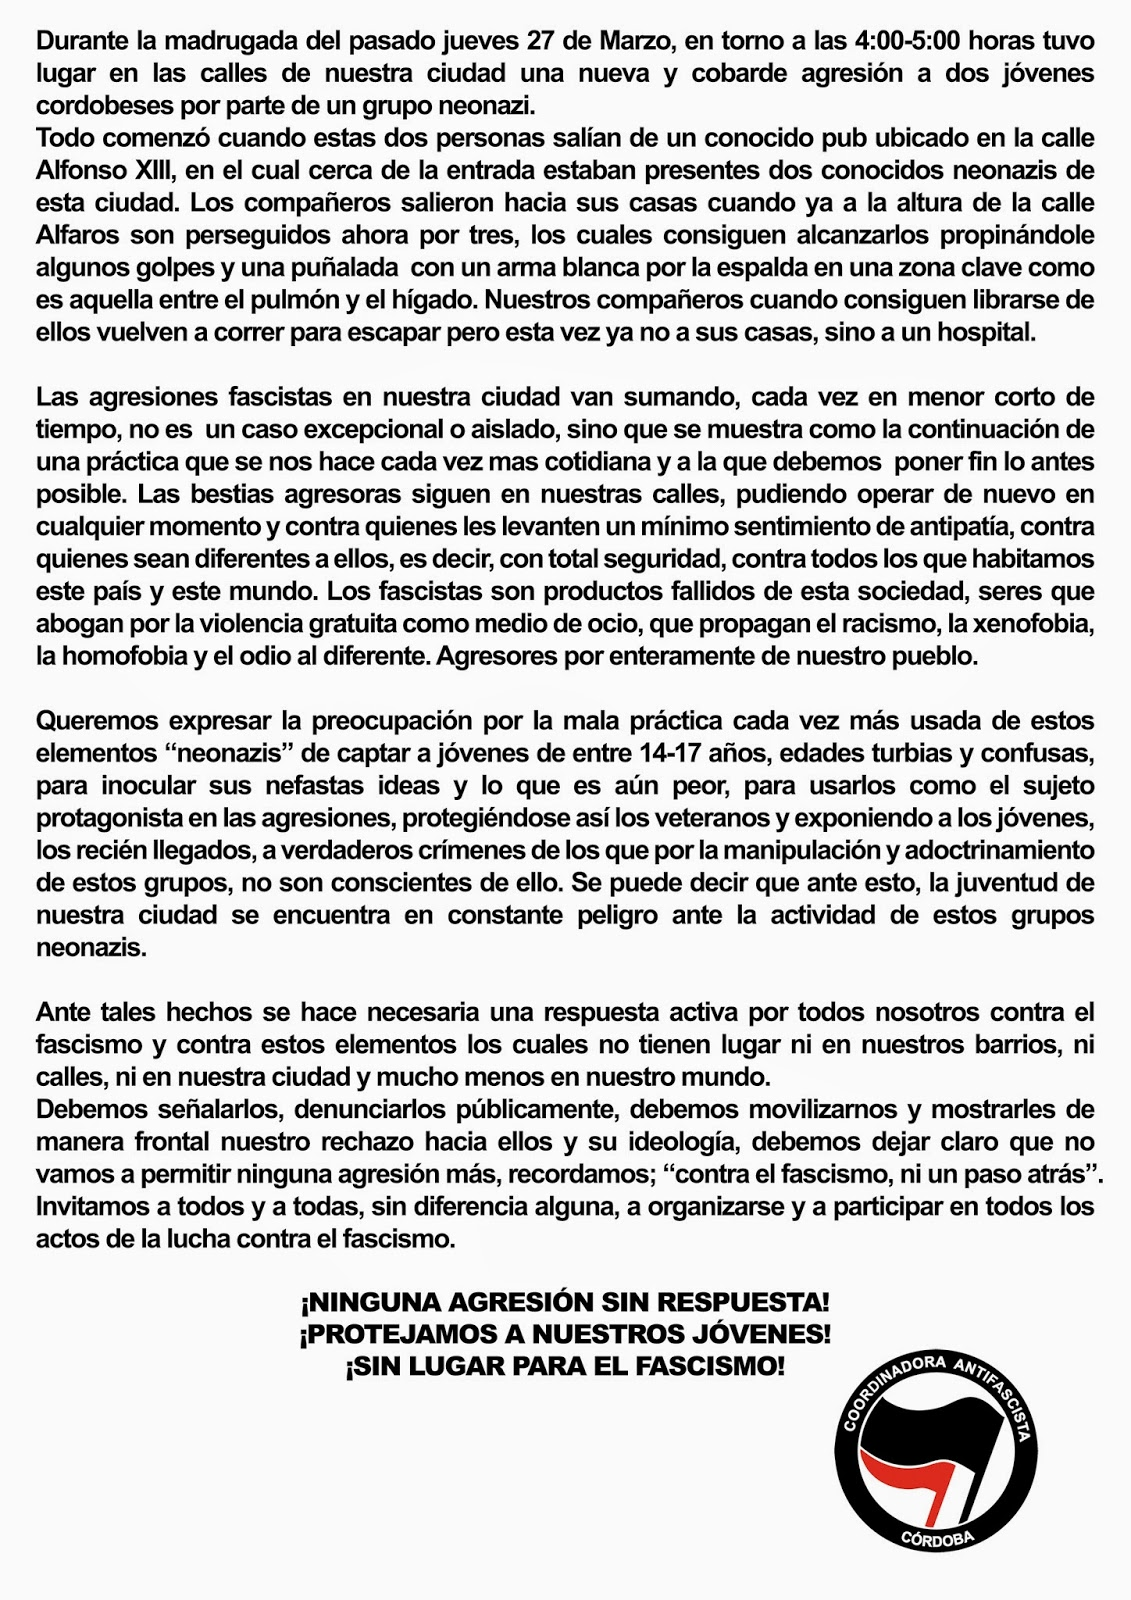 http://coordinadorantifacordoba.blogspot.com.es/2014/03/comunicado-agresion-fascista-27-de-marzo.html